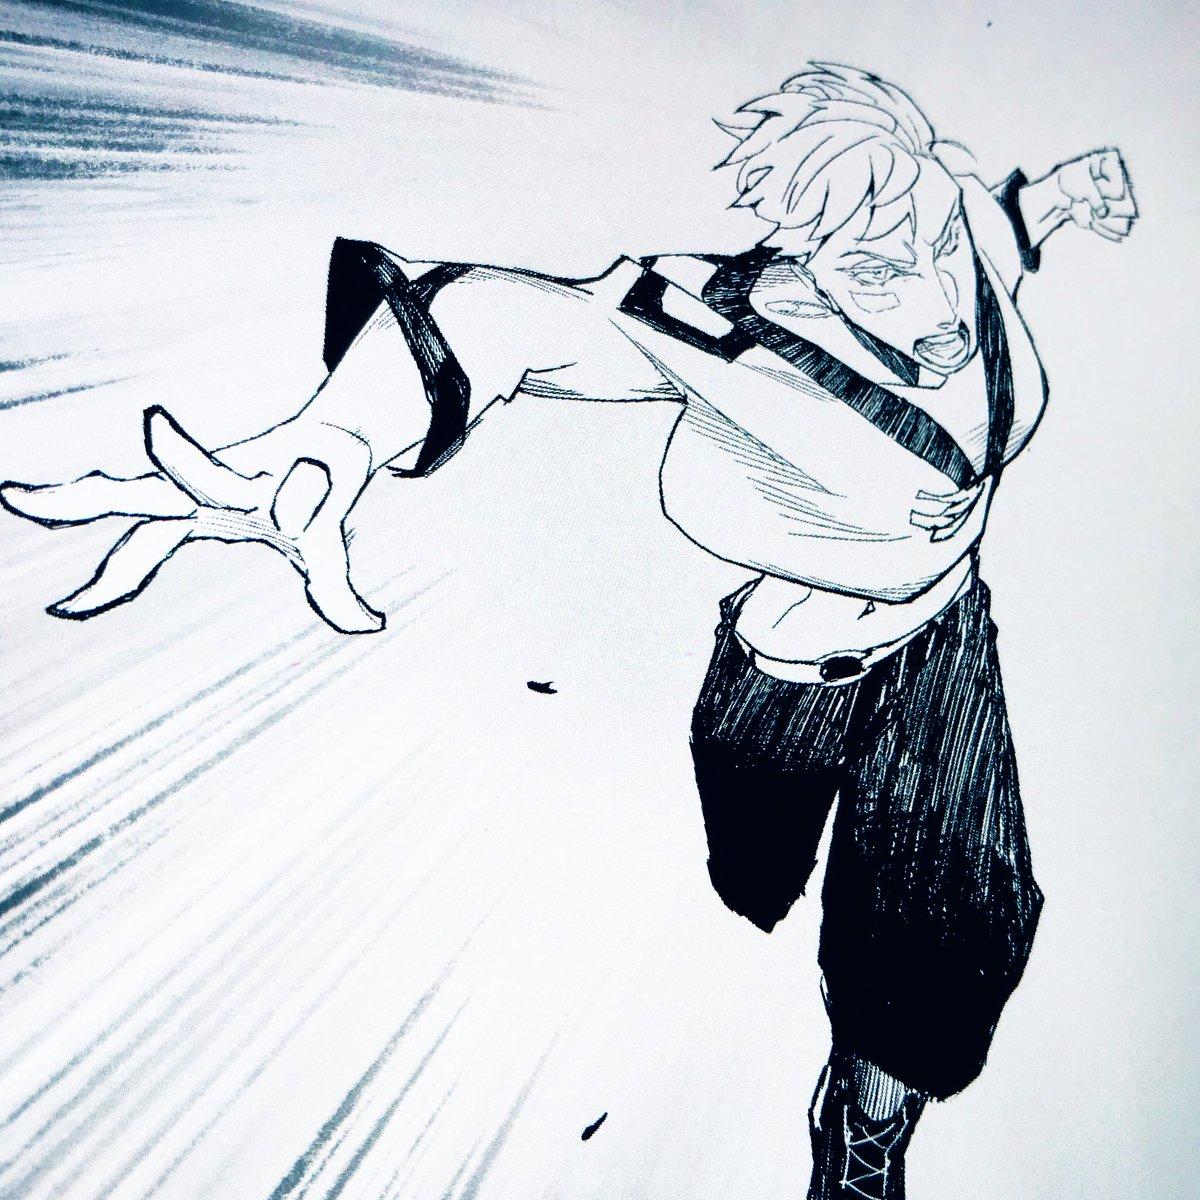 It's a pleasure to draw a strong woman oc. She's a badass #comic #manga #LINEマンガ #precreate #digital #art #イラスト #マンガ pic.twitter.com/kRtB0FVwsS